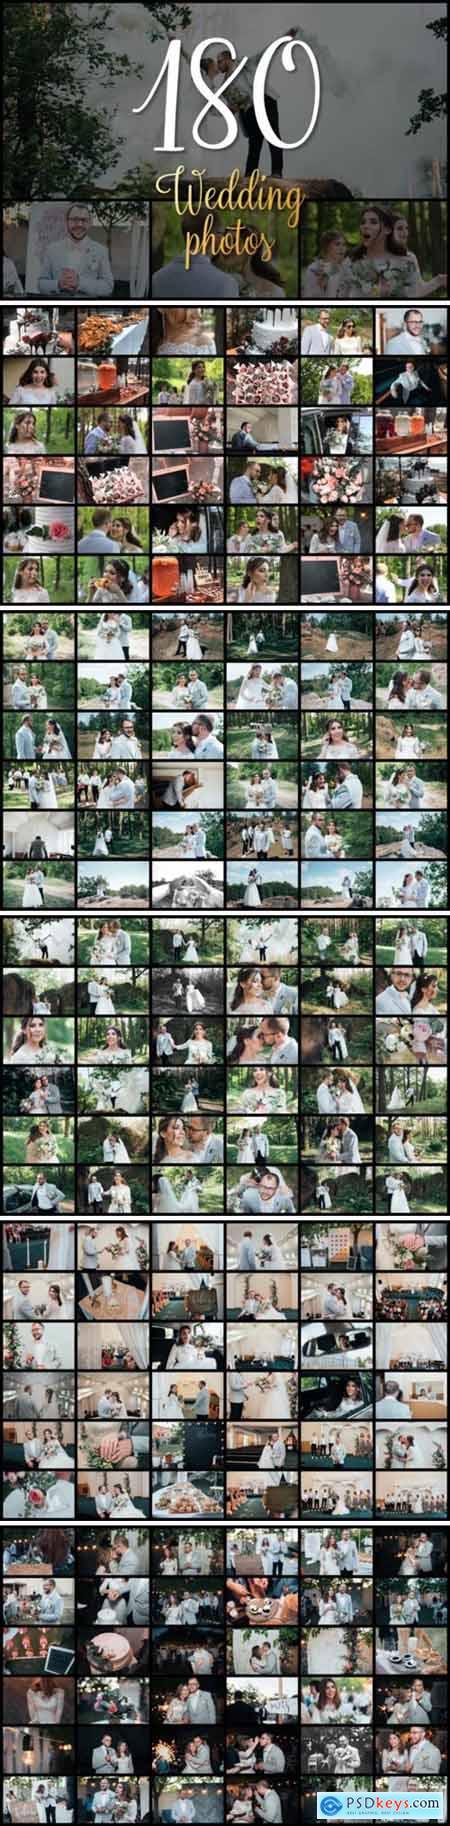 Set of 180 Wedding Photos 6089718